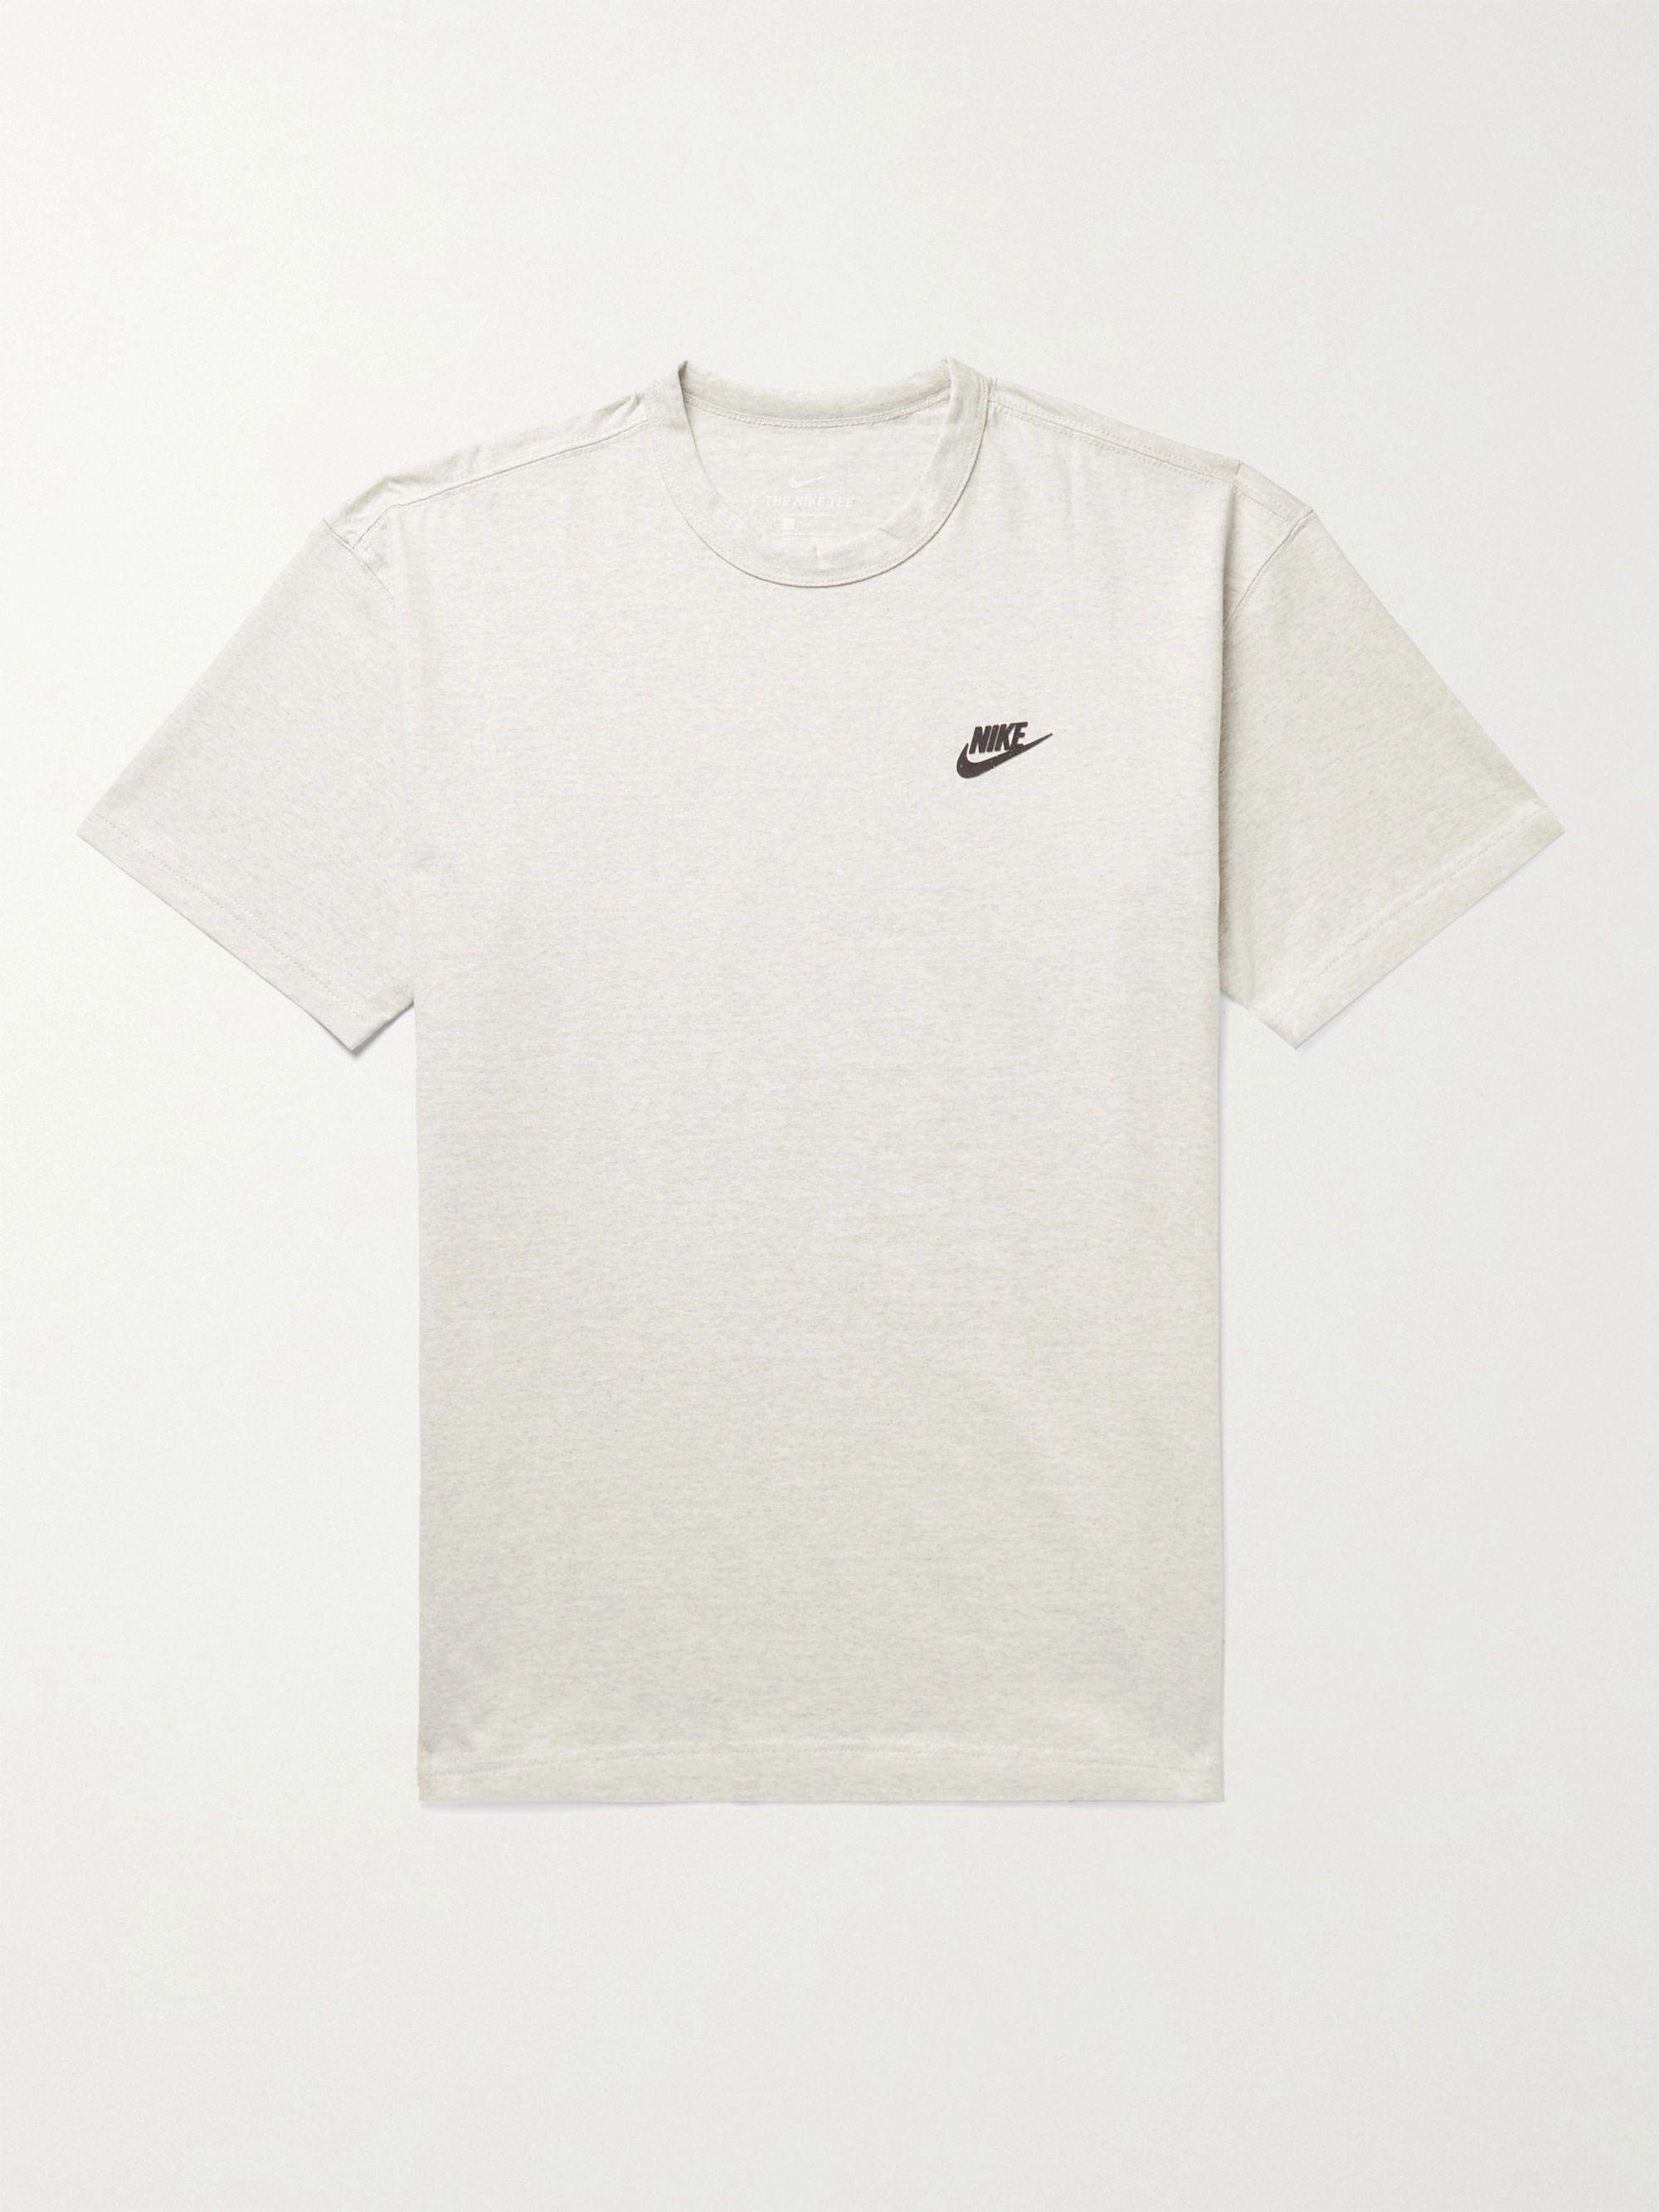 NIKE Sportswear Logo-Appliqued Melange Cotton-Blend Jersey T-Shirt